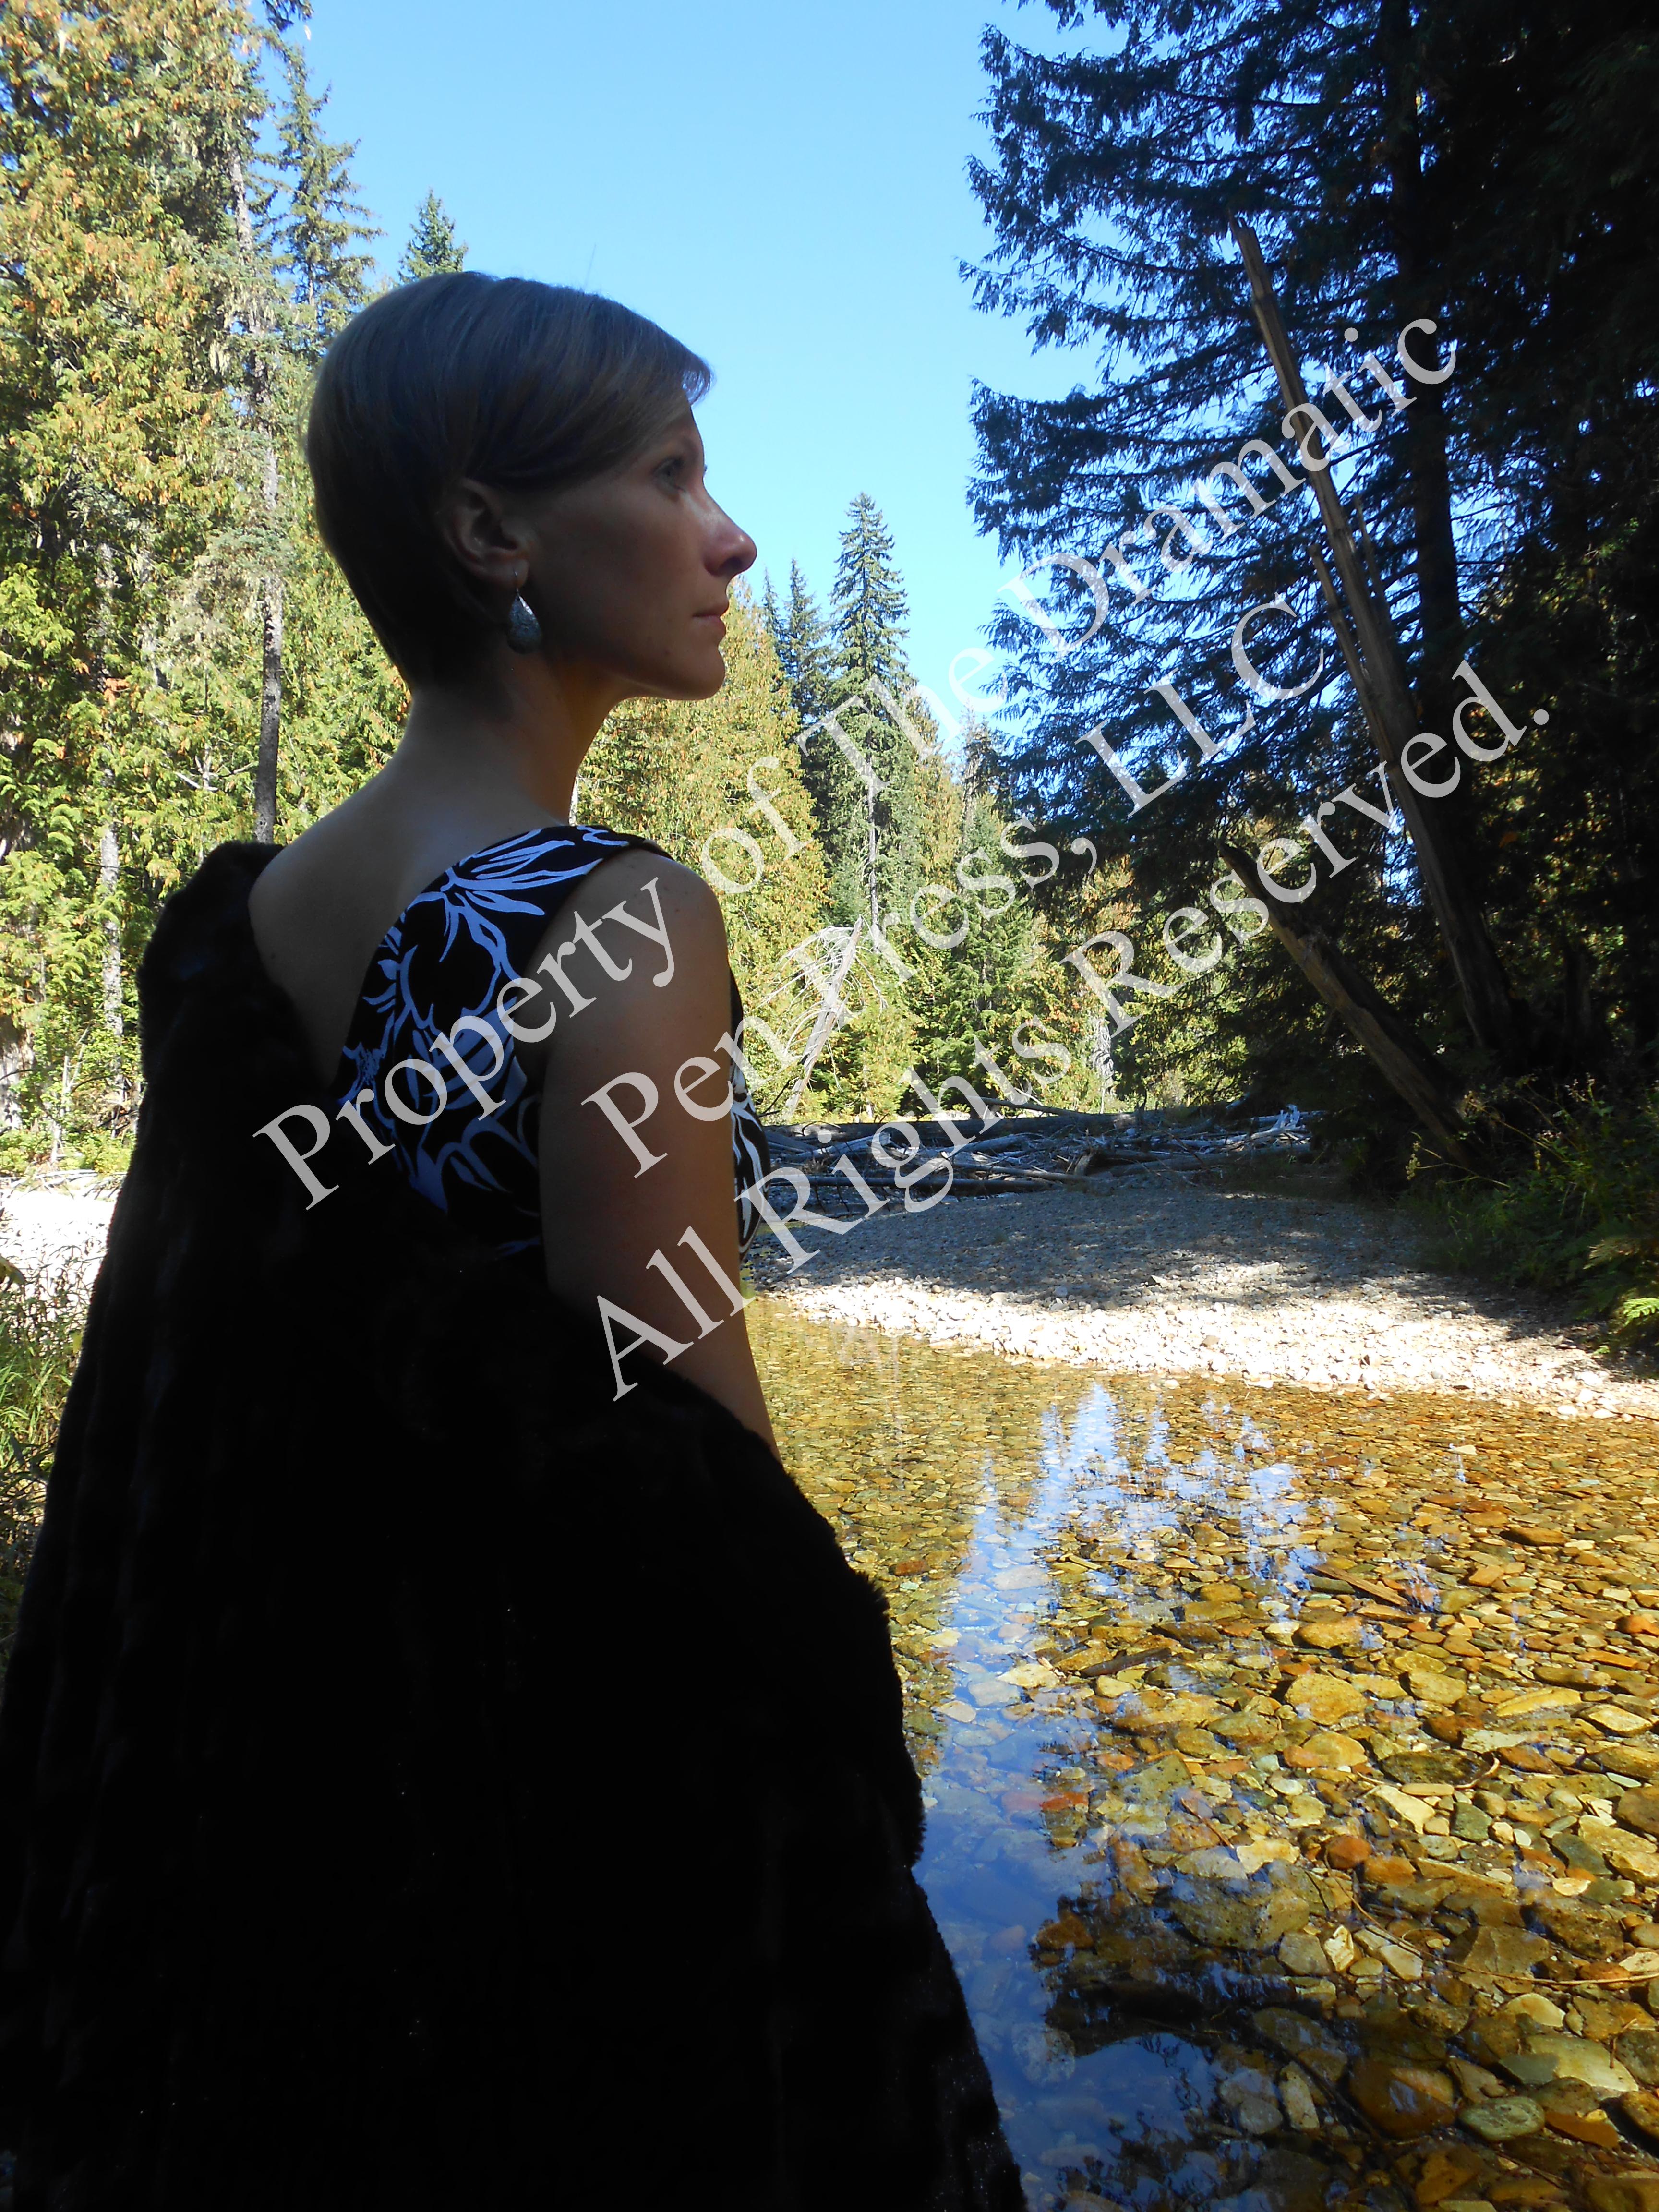 Woman Fur Coat by River